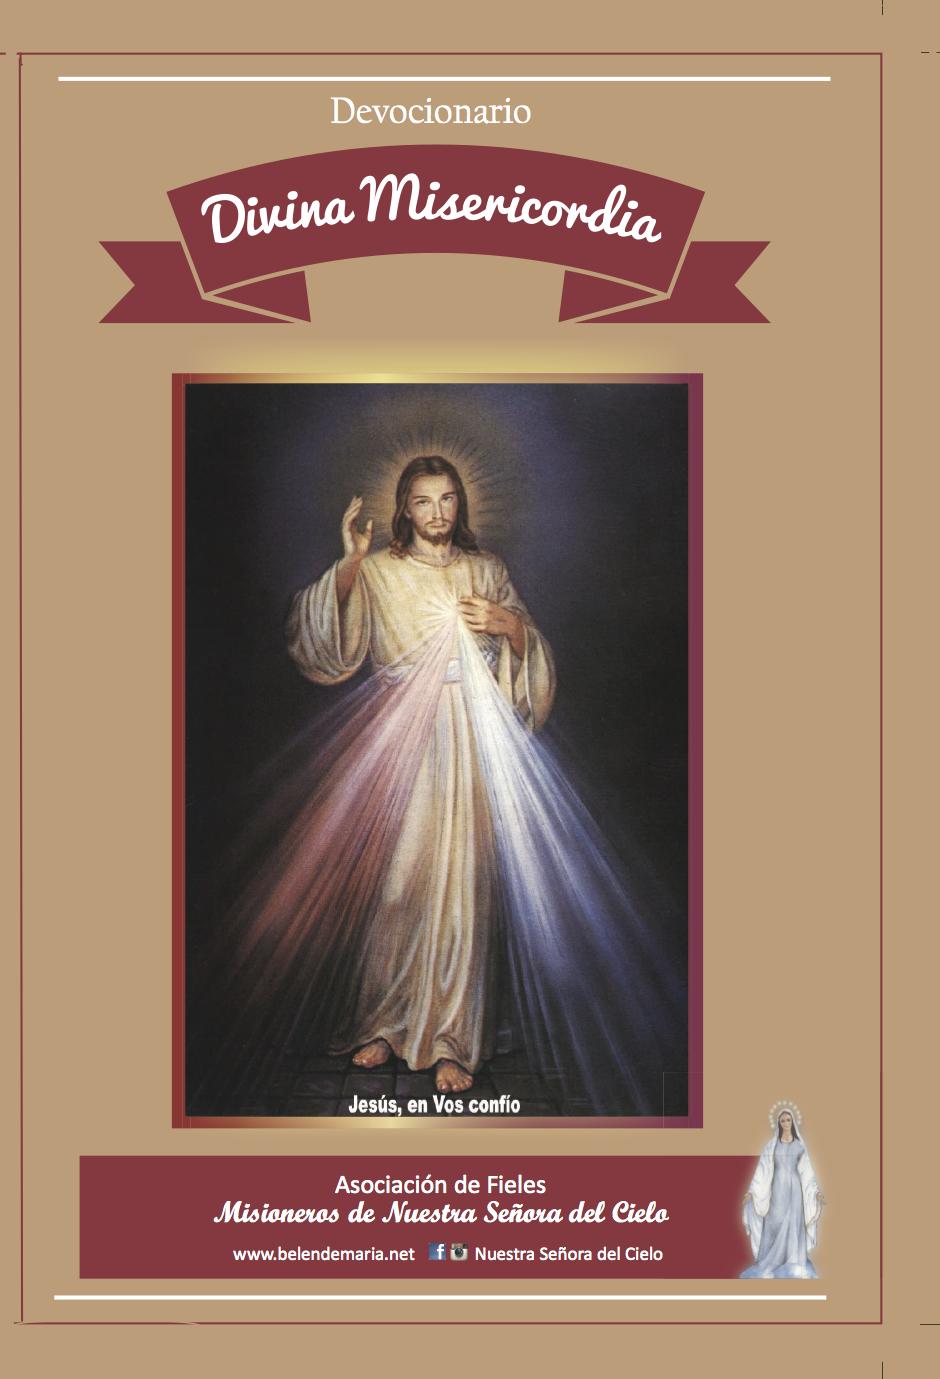 Novena Divina Misericordia (page 1)